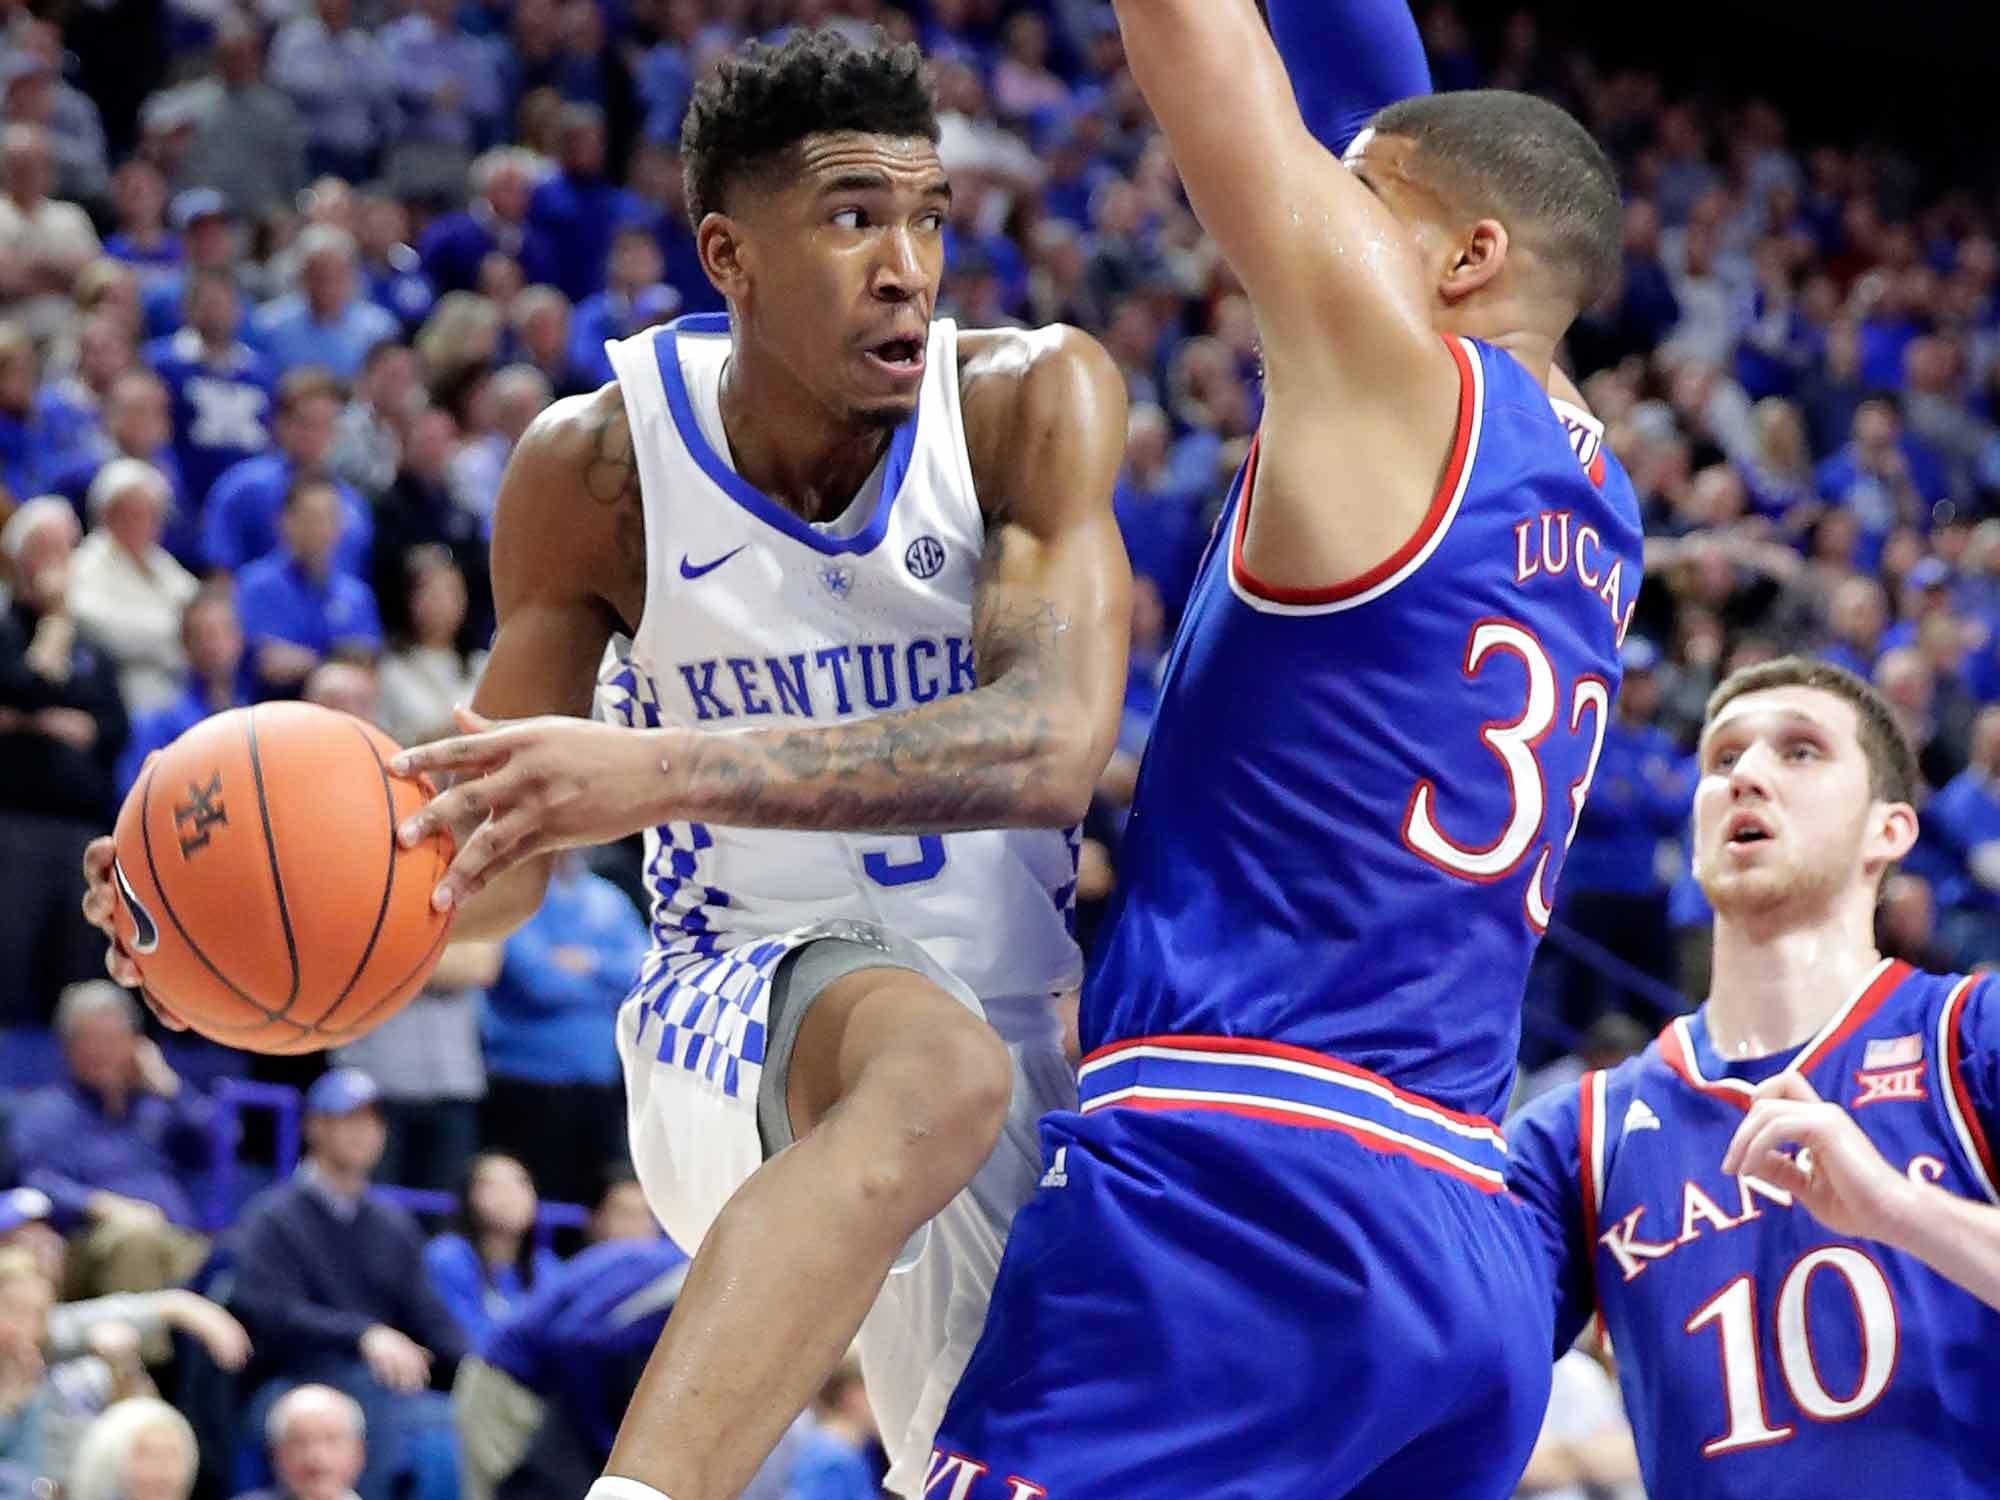 Uk Basketball: NCAA Tournament: 8 Prospects Every NBA Fan Should Watch